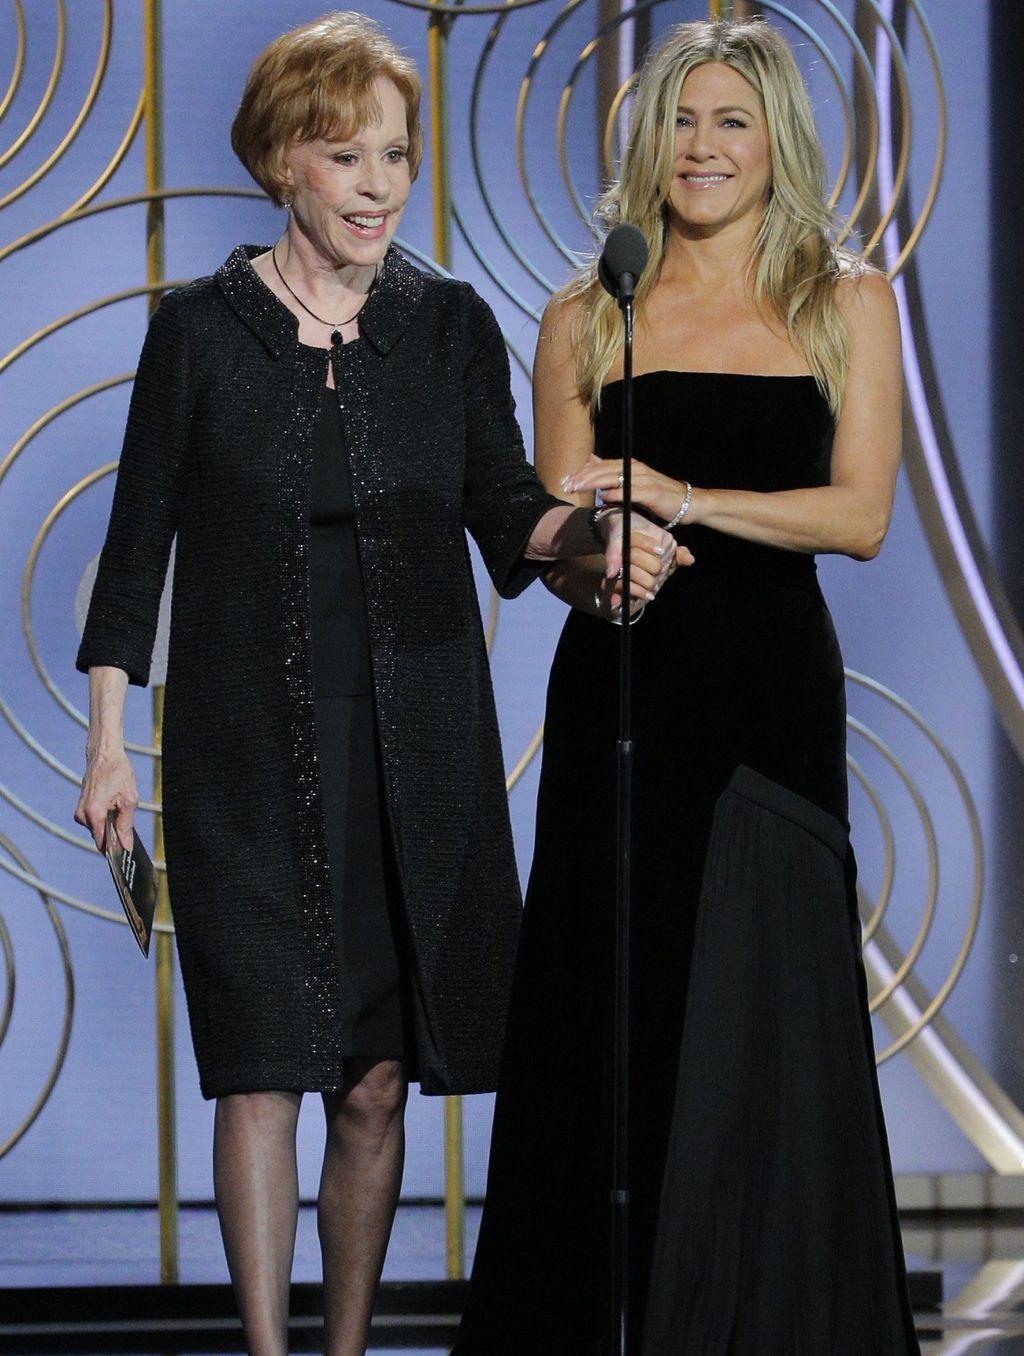 Jennifer Aniston i Carol Burnett na dodjeli nagrada Zlatni globus